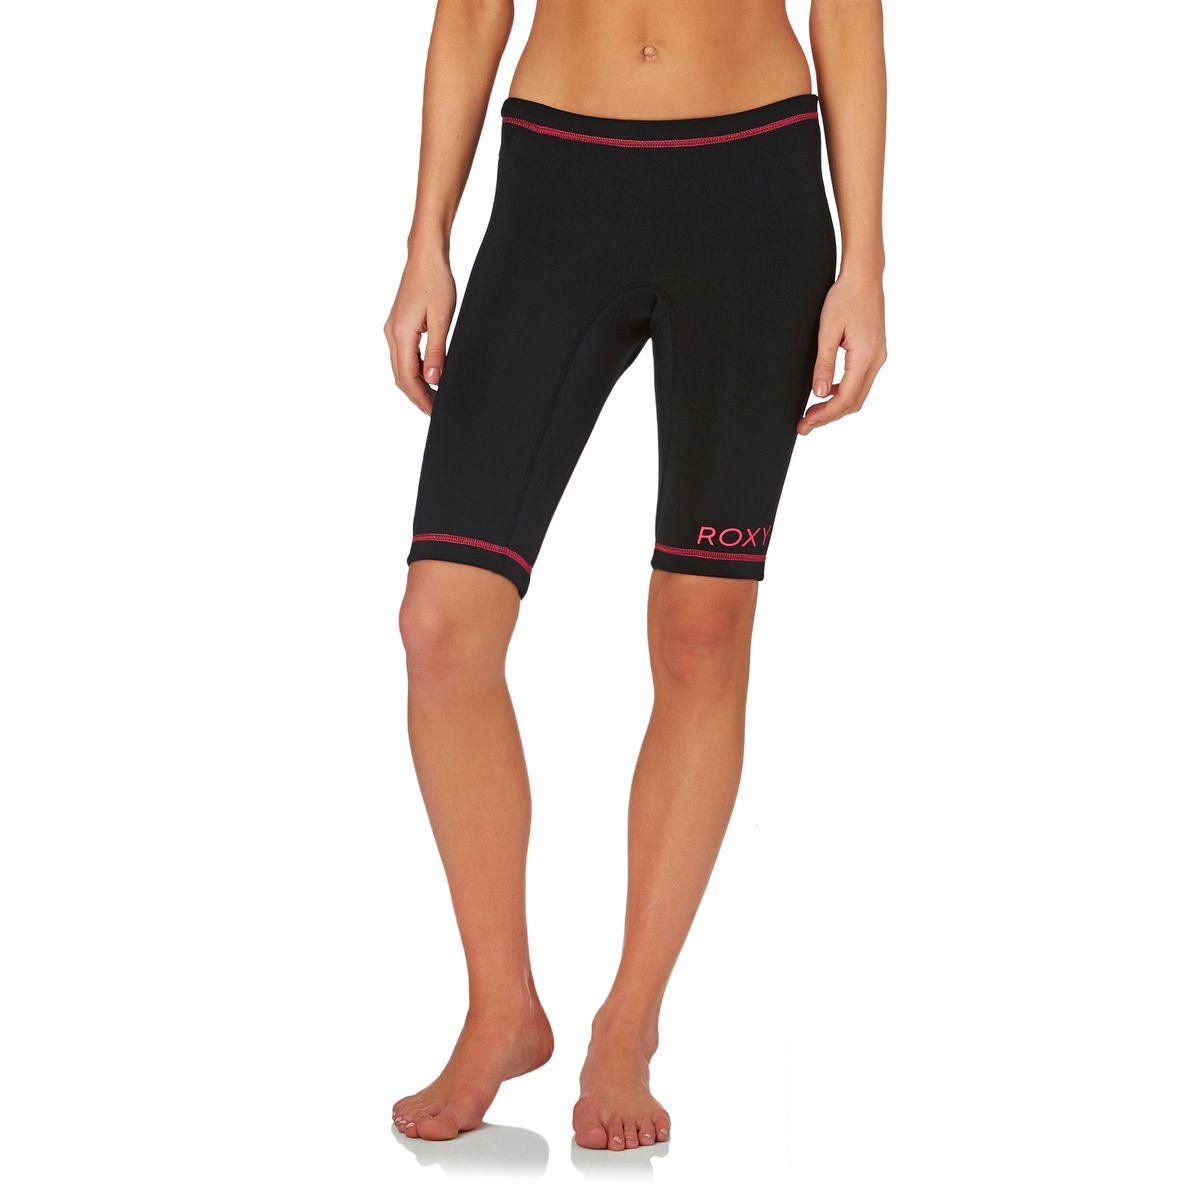 2dd65897cc Roxy Syncro 1mm 2017 Reef Wetsuit Shorts - True Black